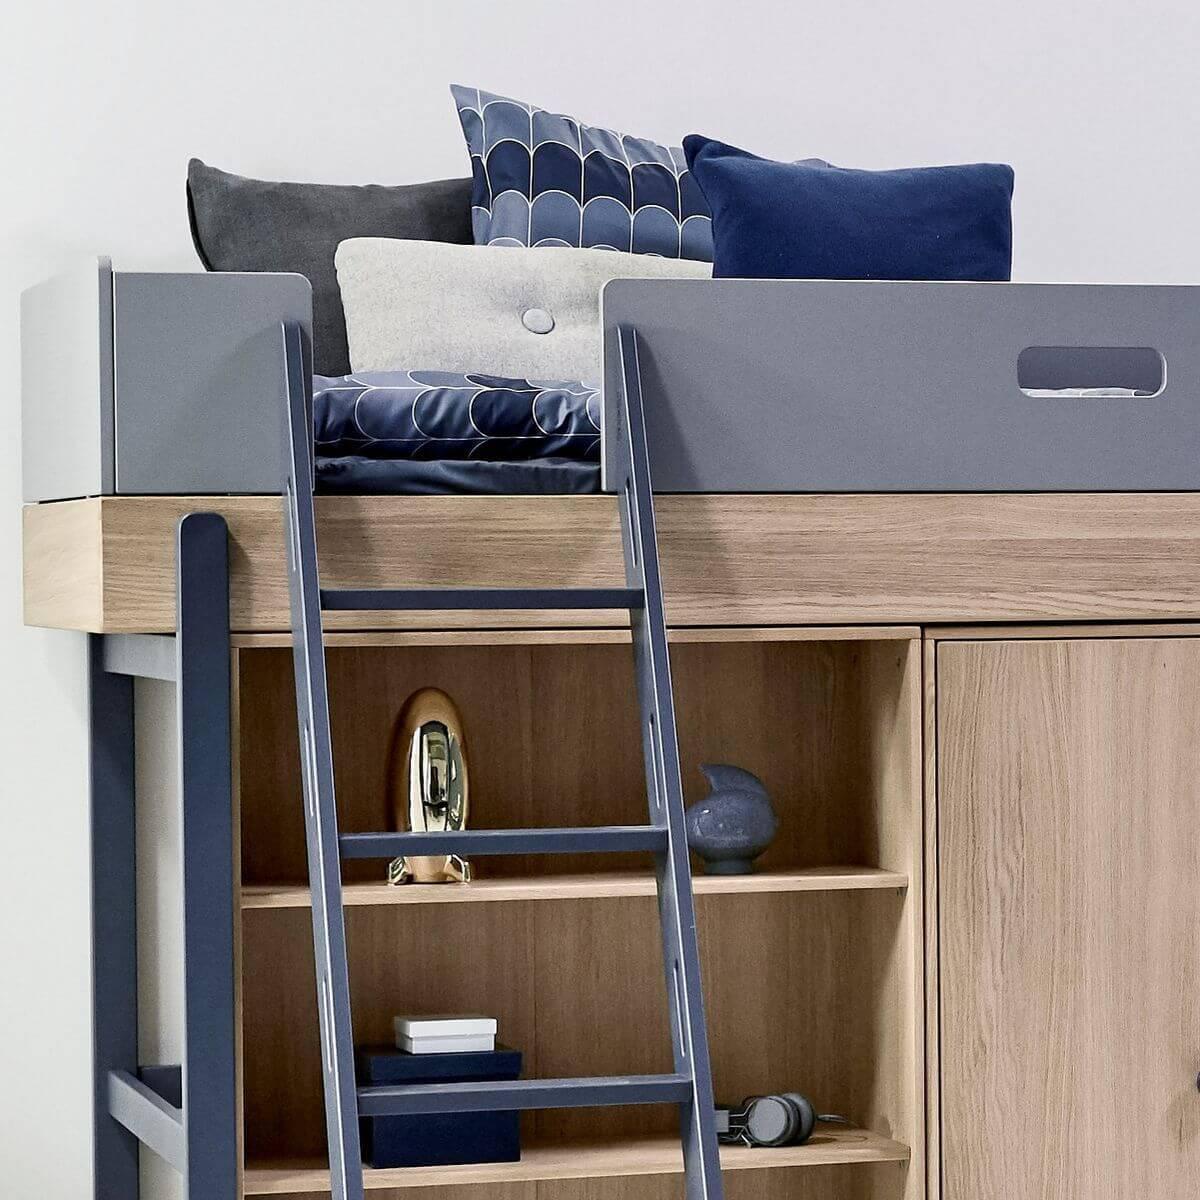 Funda nórdica 140x200cm-almohada 60x63cm POPSICLE Flexa blueberry